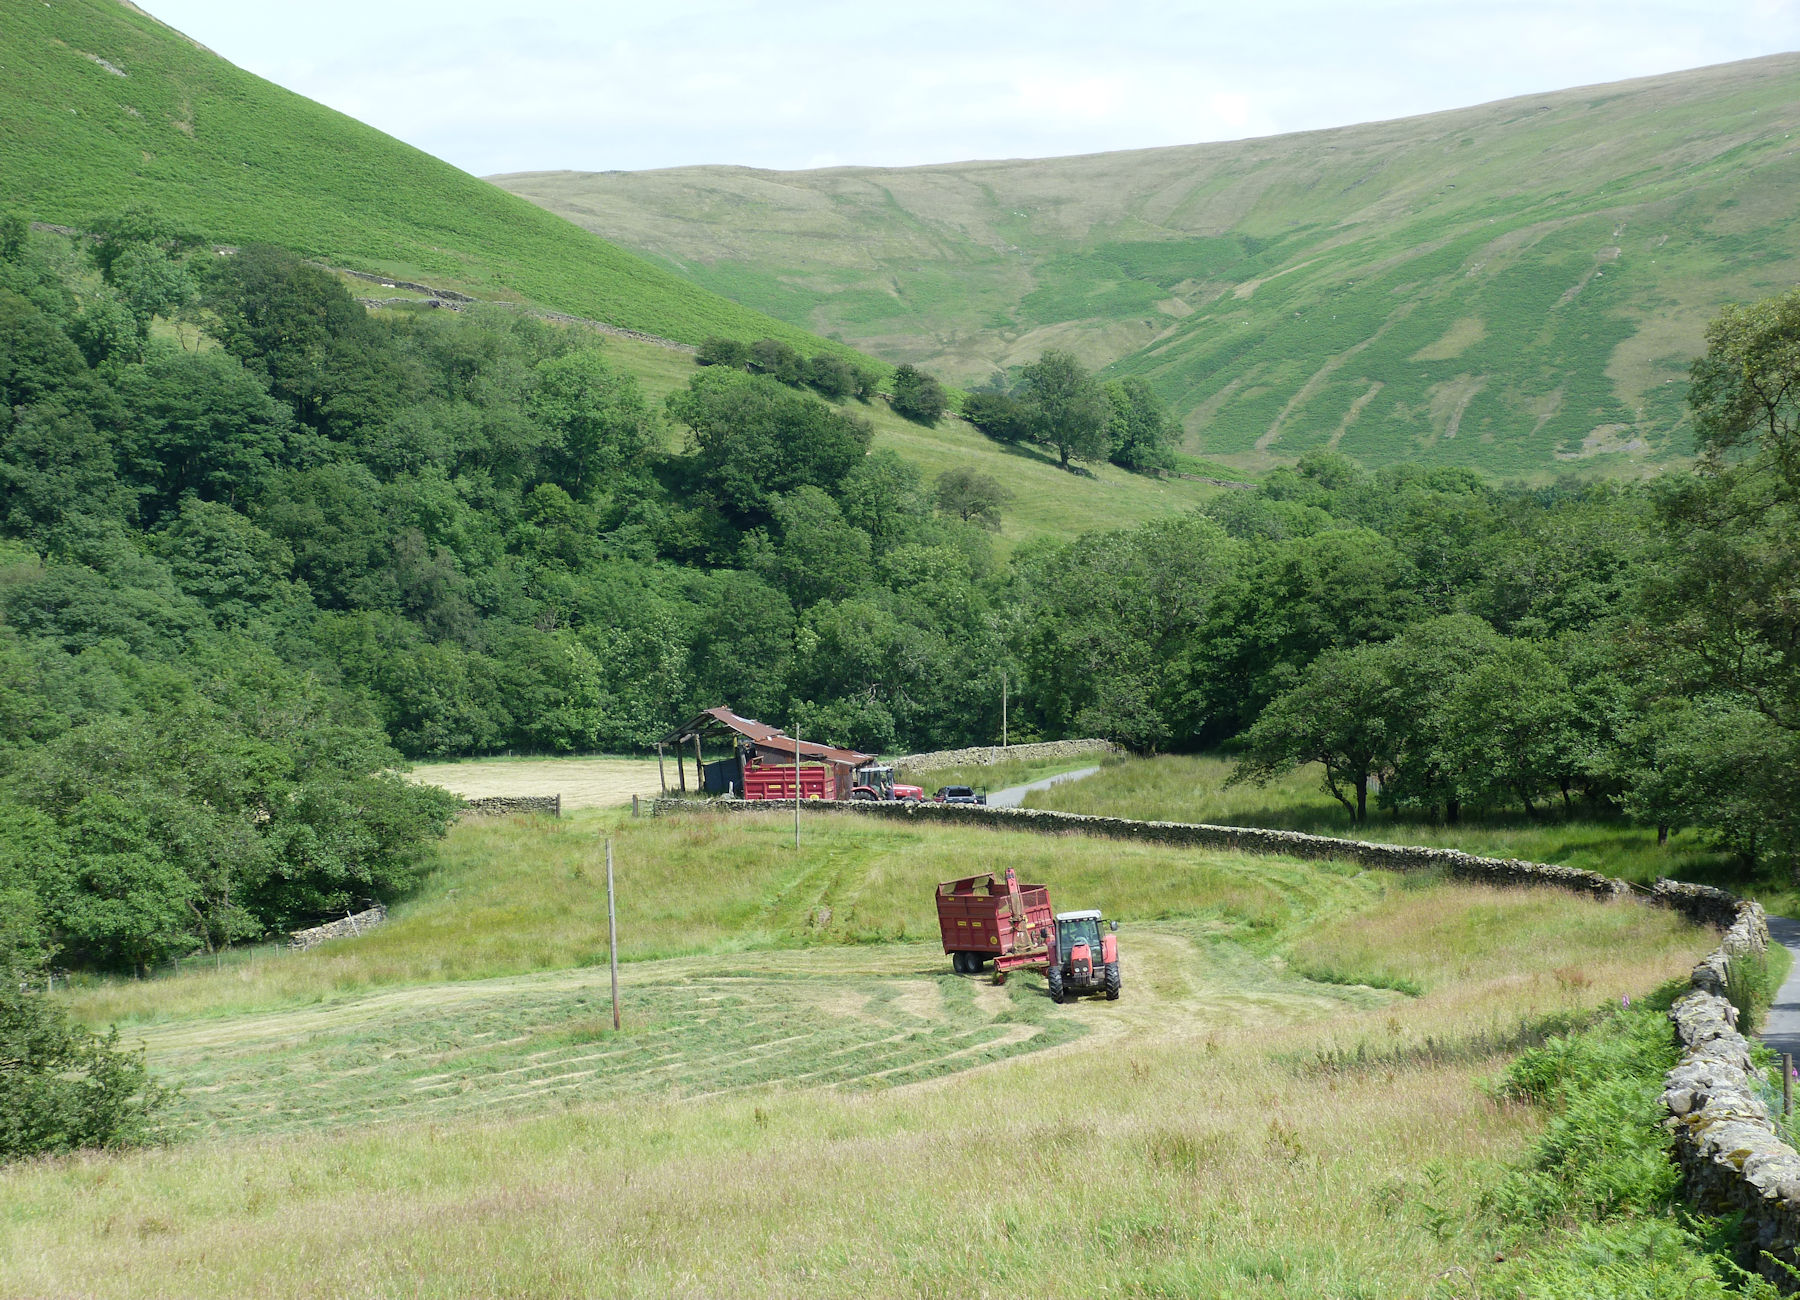 Tractors in Borrowdale